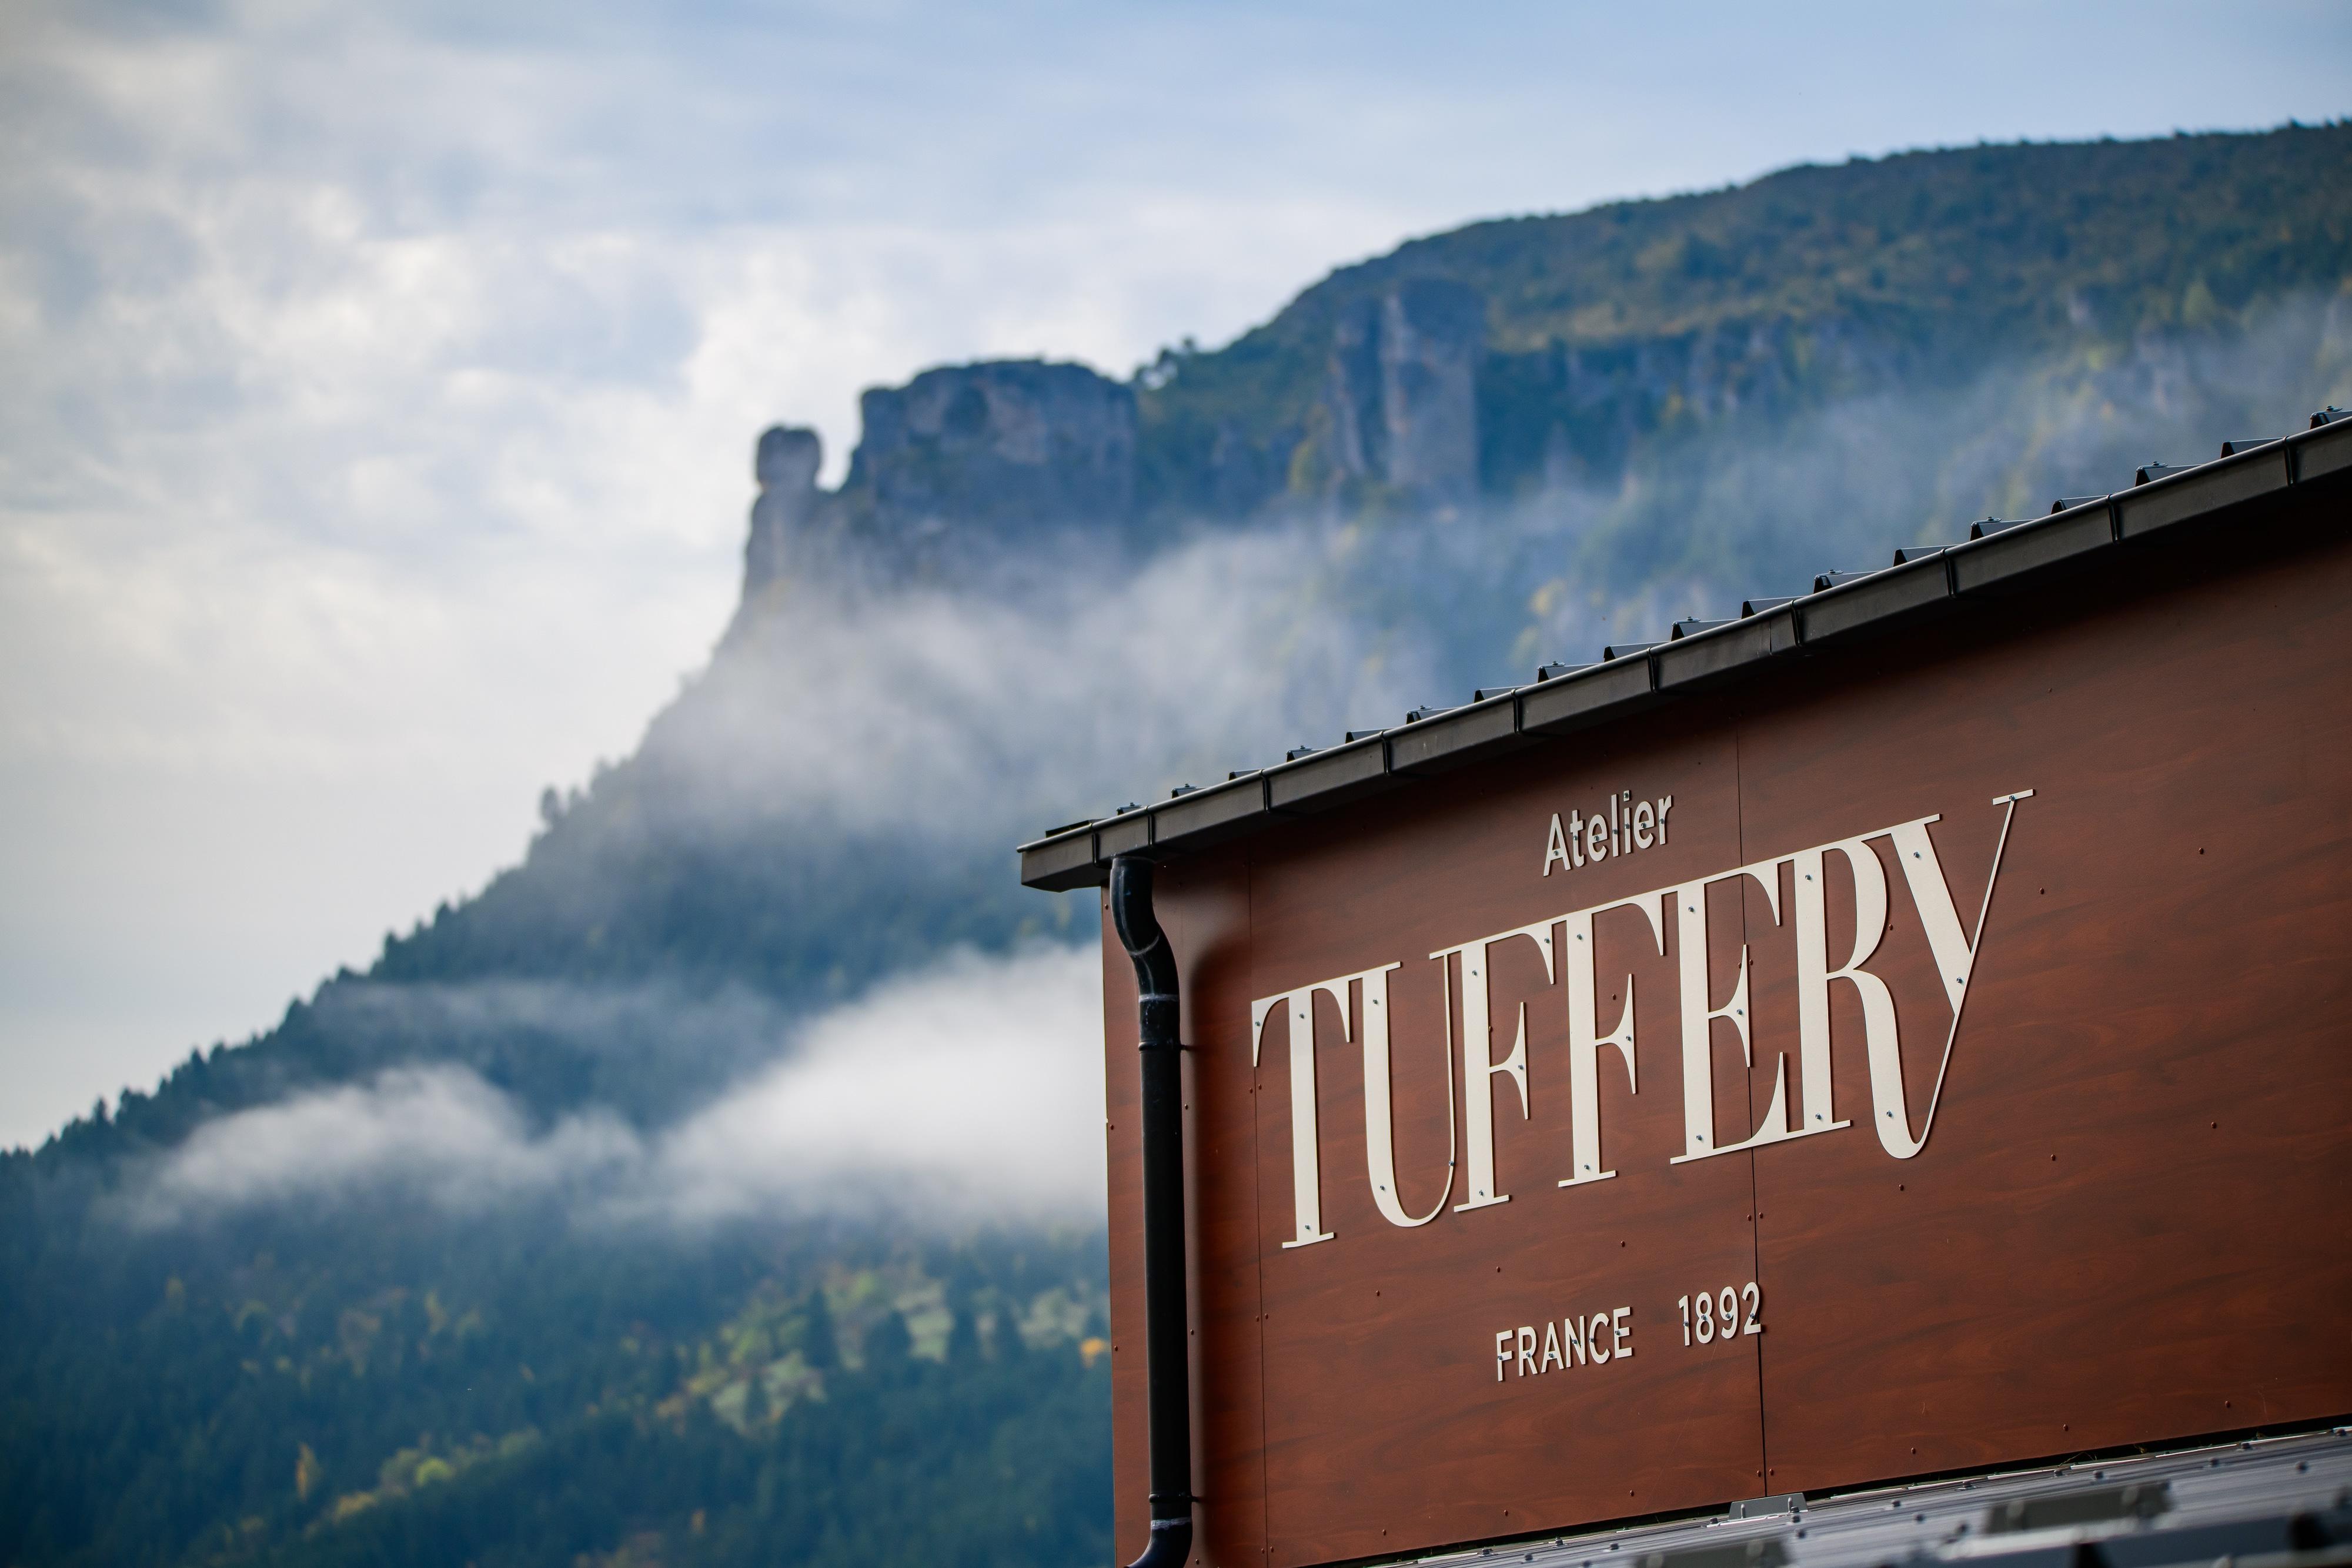 atelier tuffery defis rentree innovation cevennes made in france